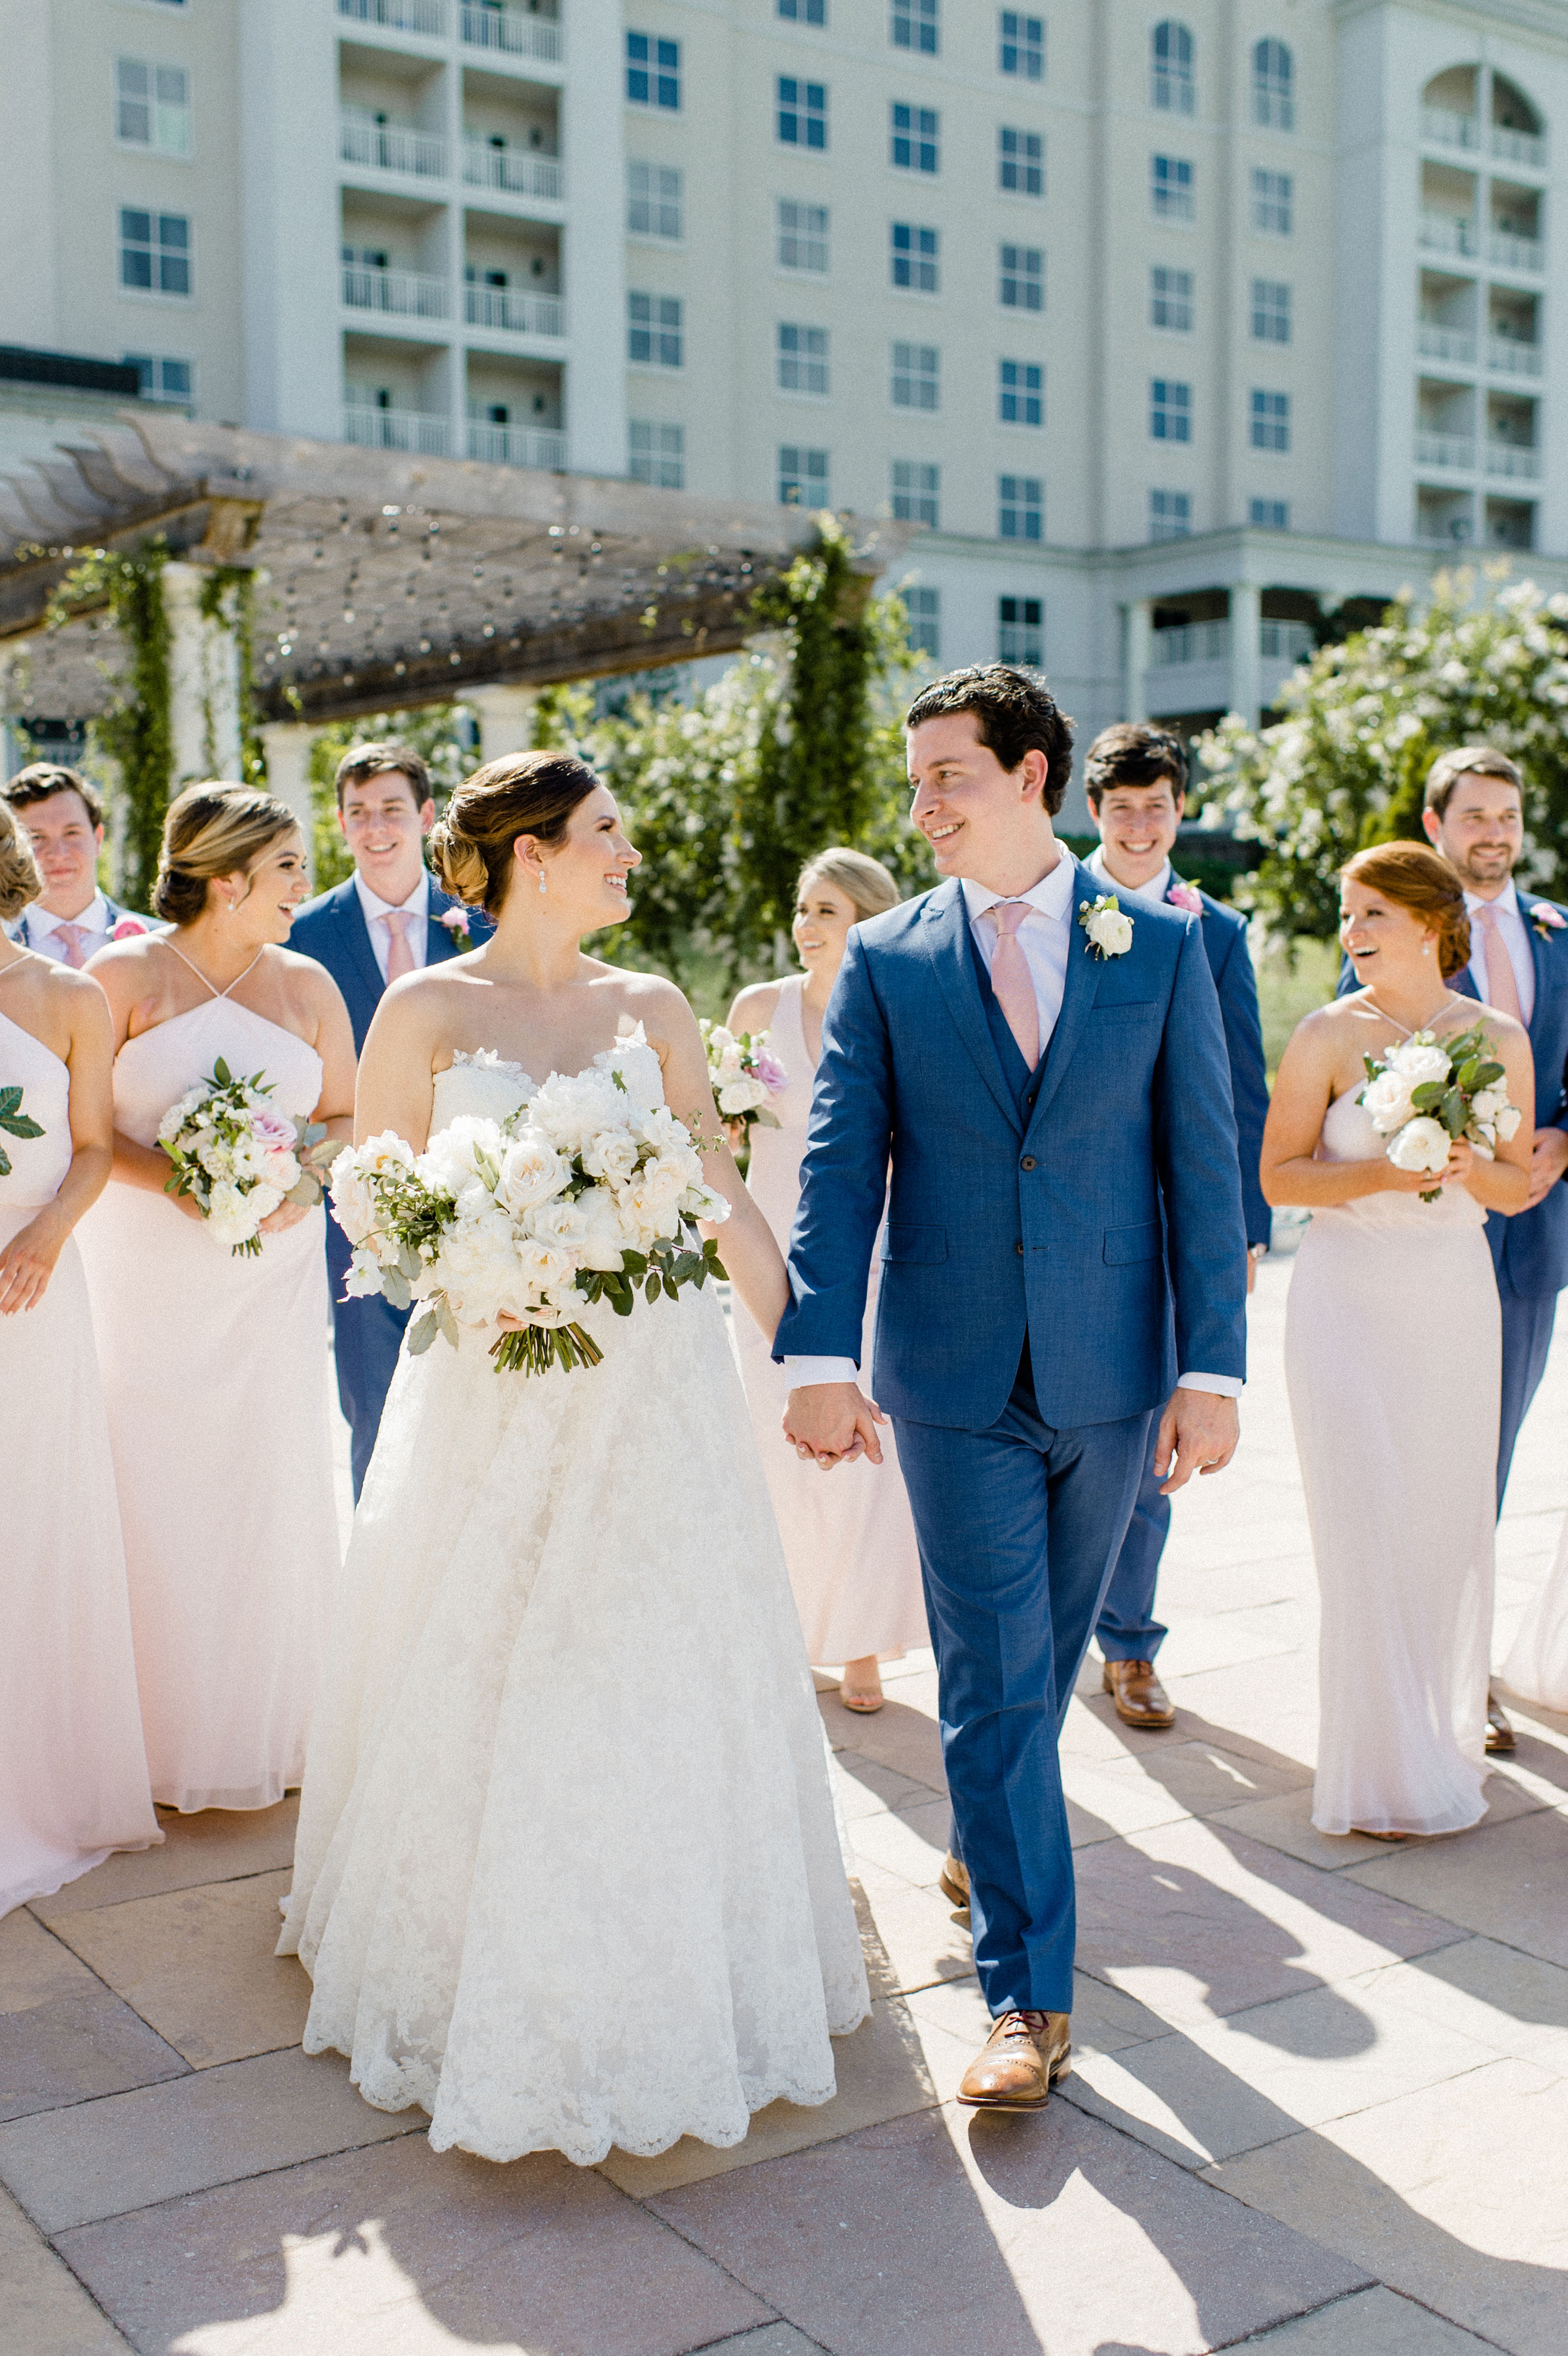 McElravey_Wedding_CarolineLimaPhotography_2018_184.jpg